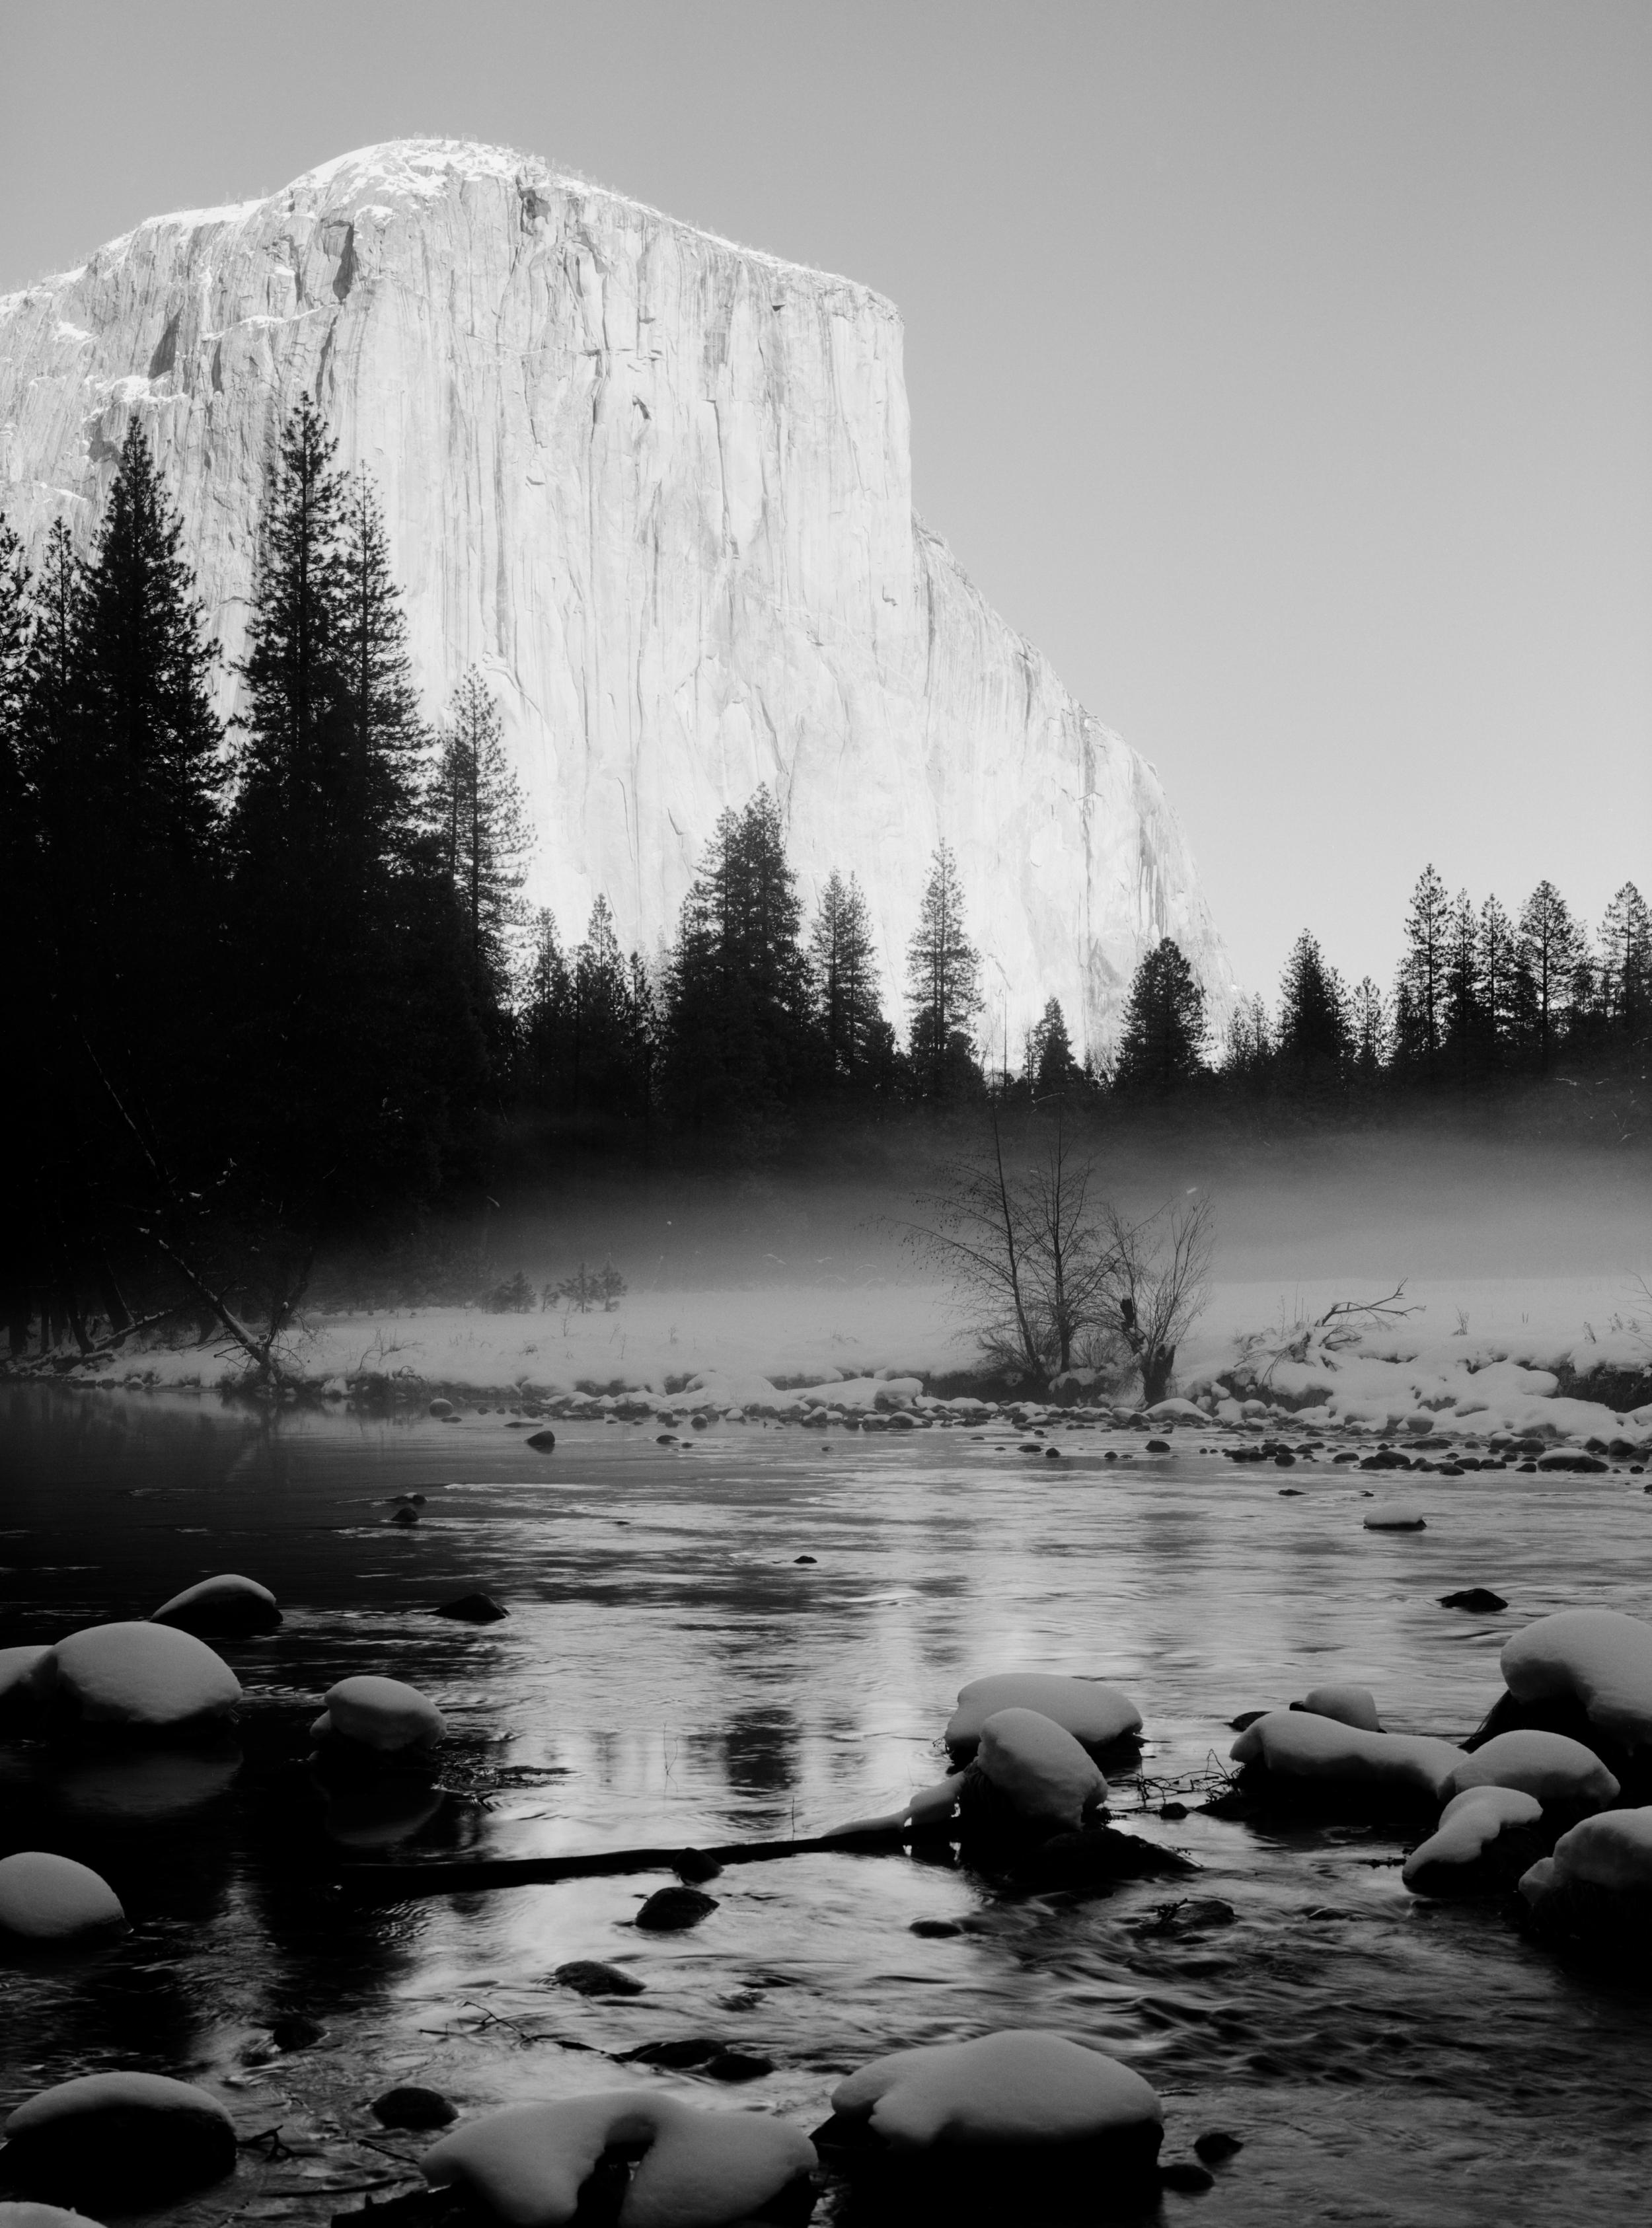 """El Capitan,"" 2006  black and white photograph, print #1  35 1/8"" x 28 1/8"""